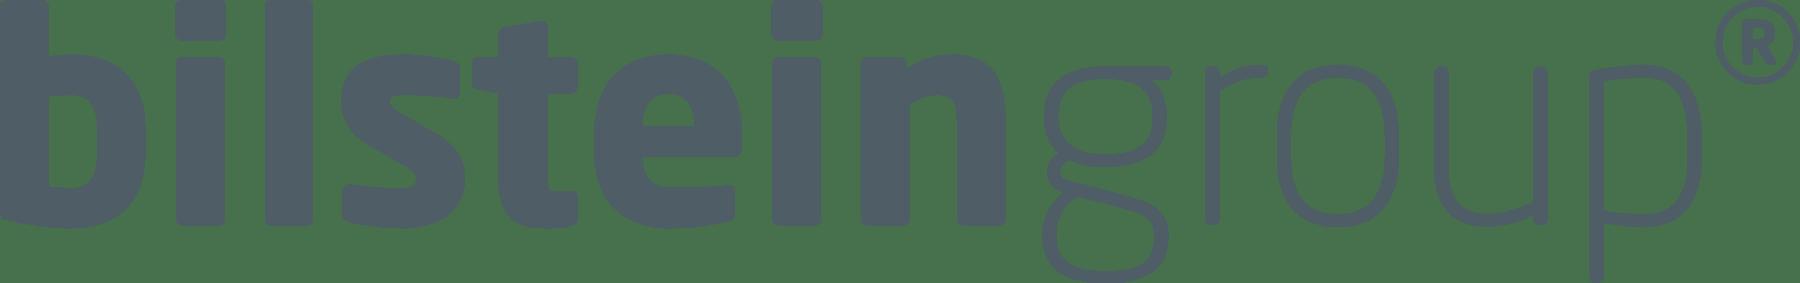 bilsteingroup_logo